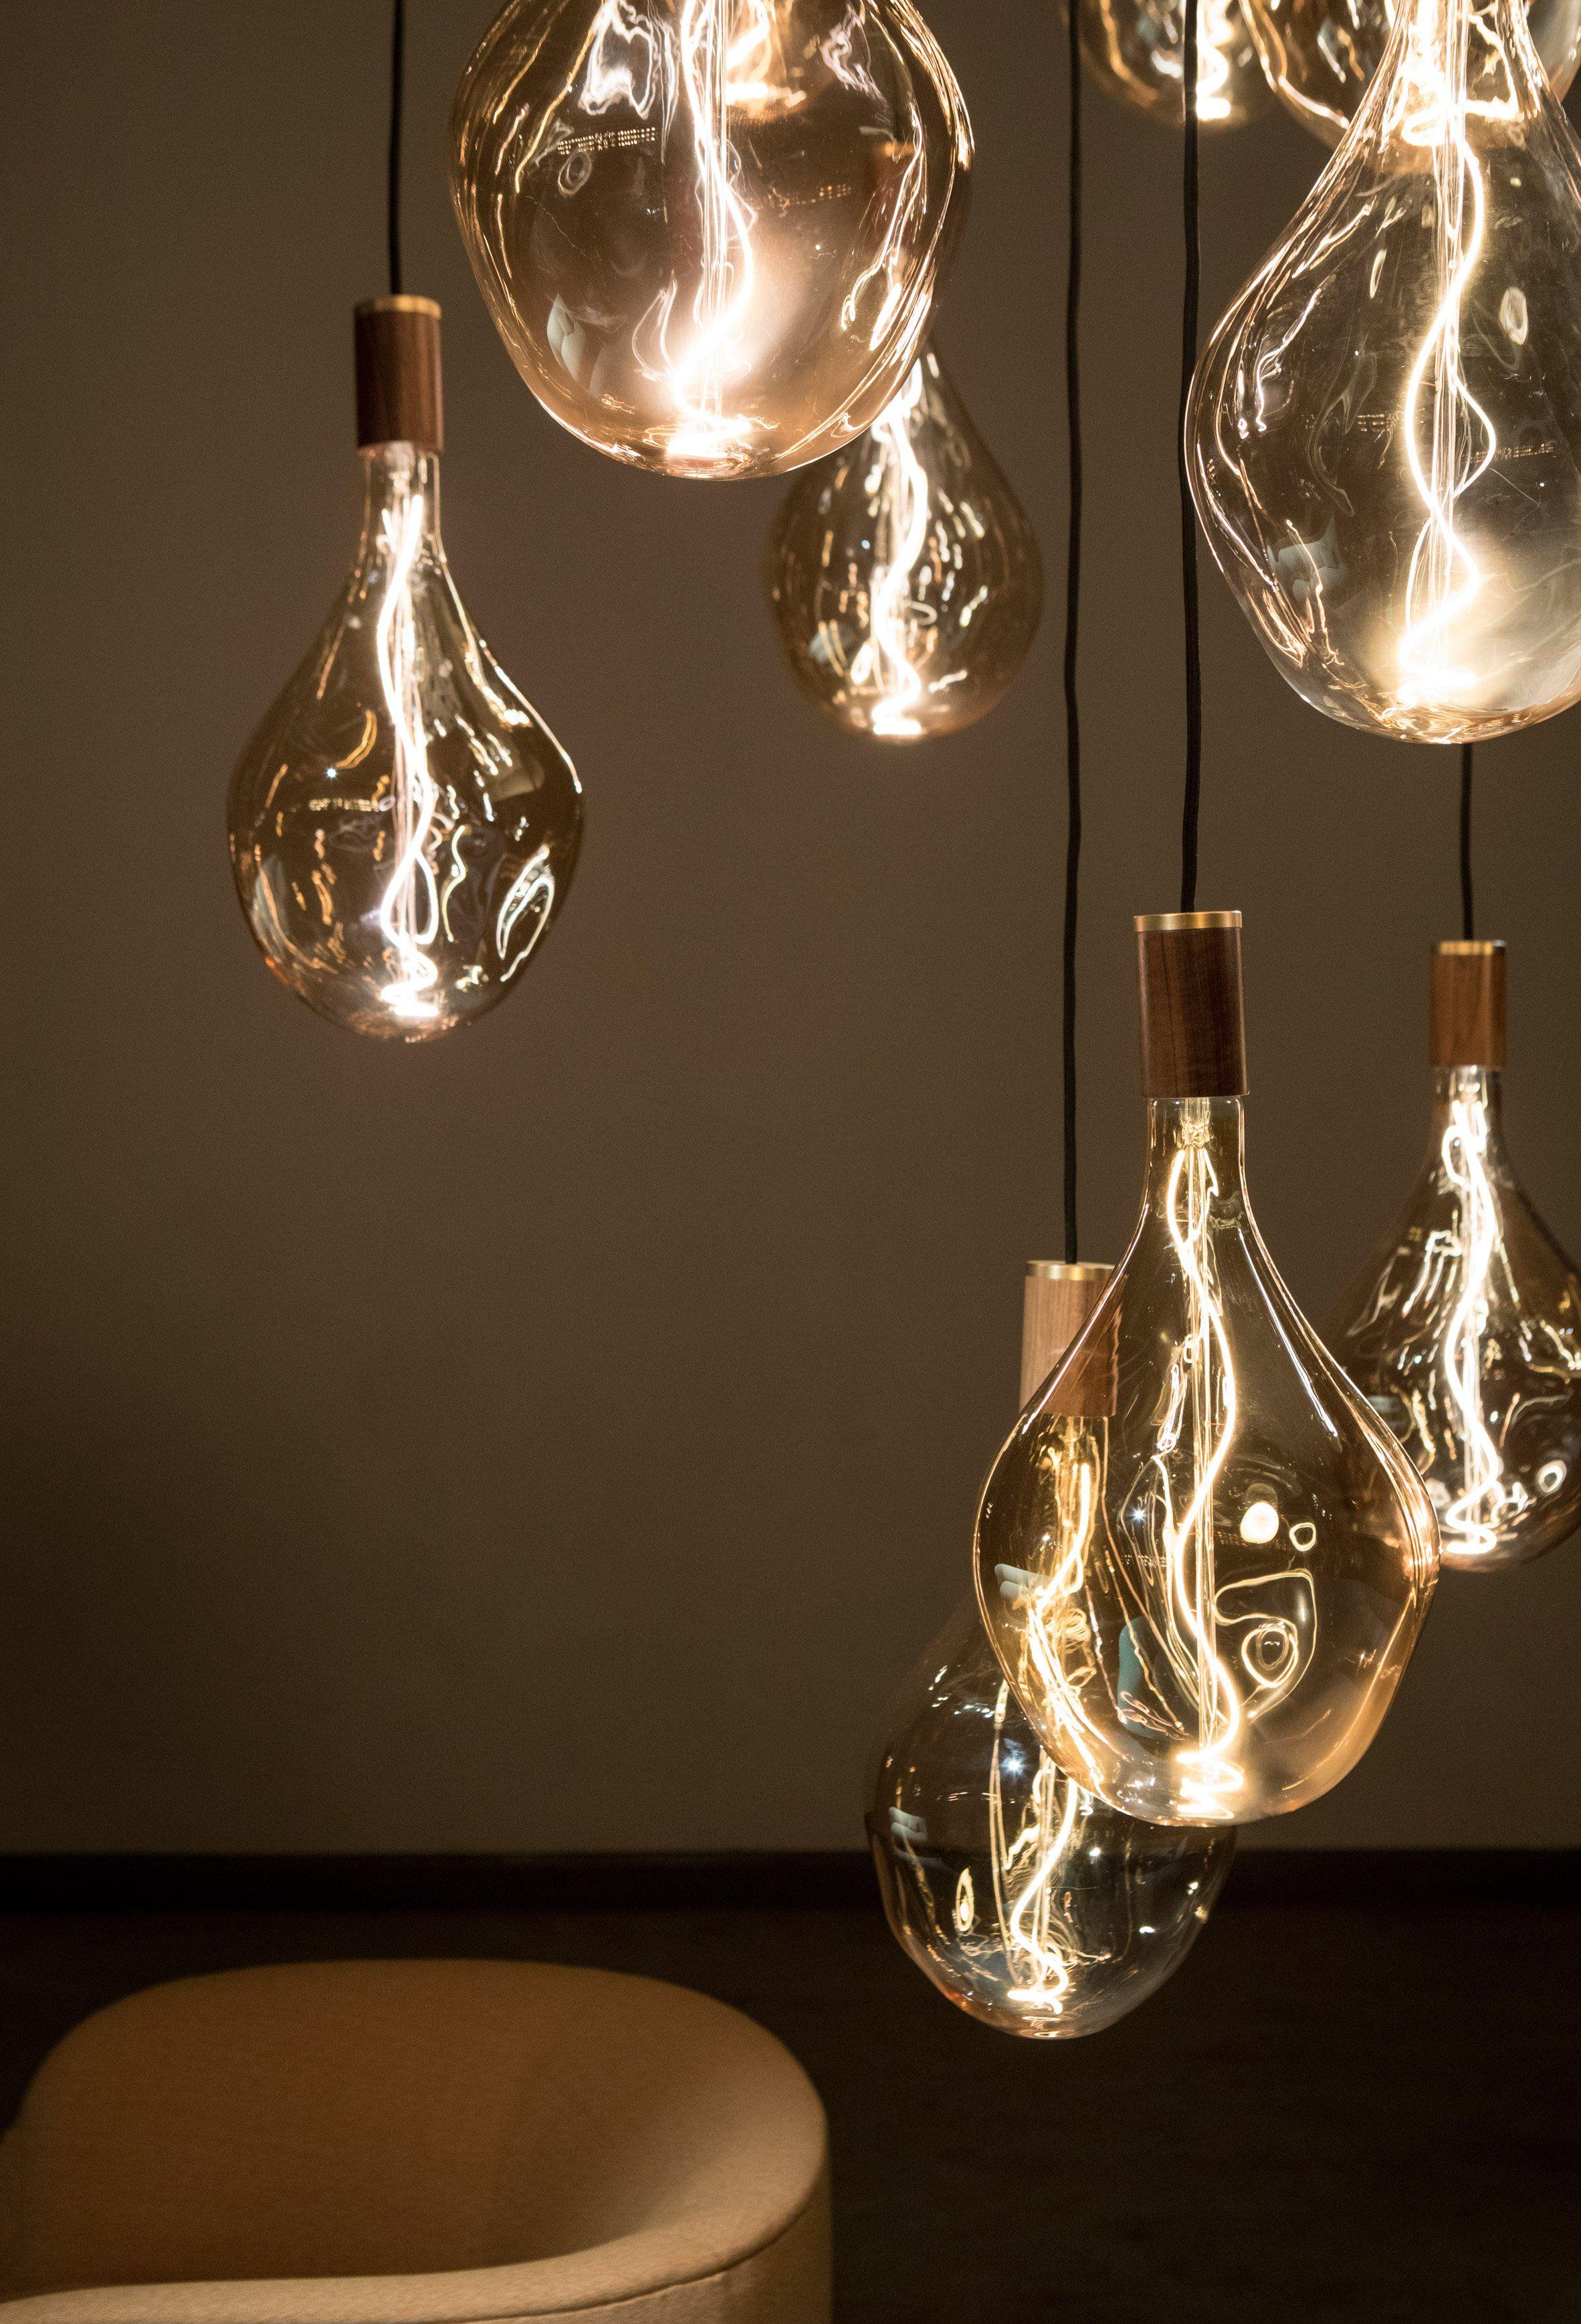 Tala Presents World S Largest Sculptural Bulb At London Design